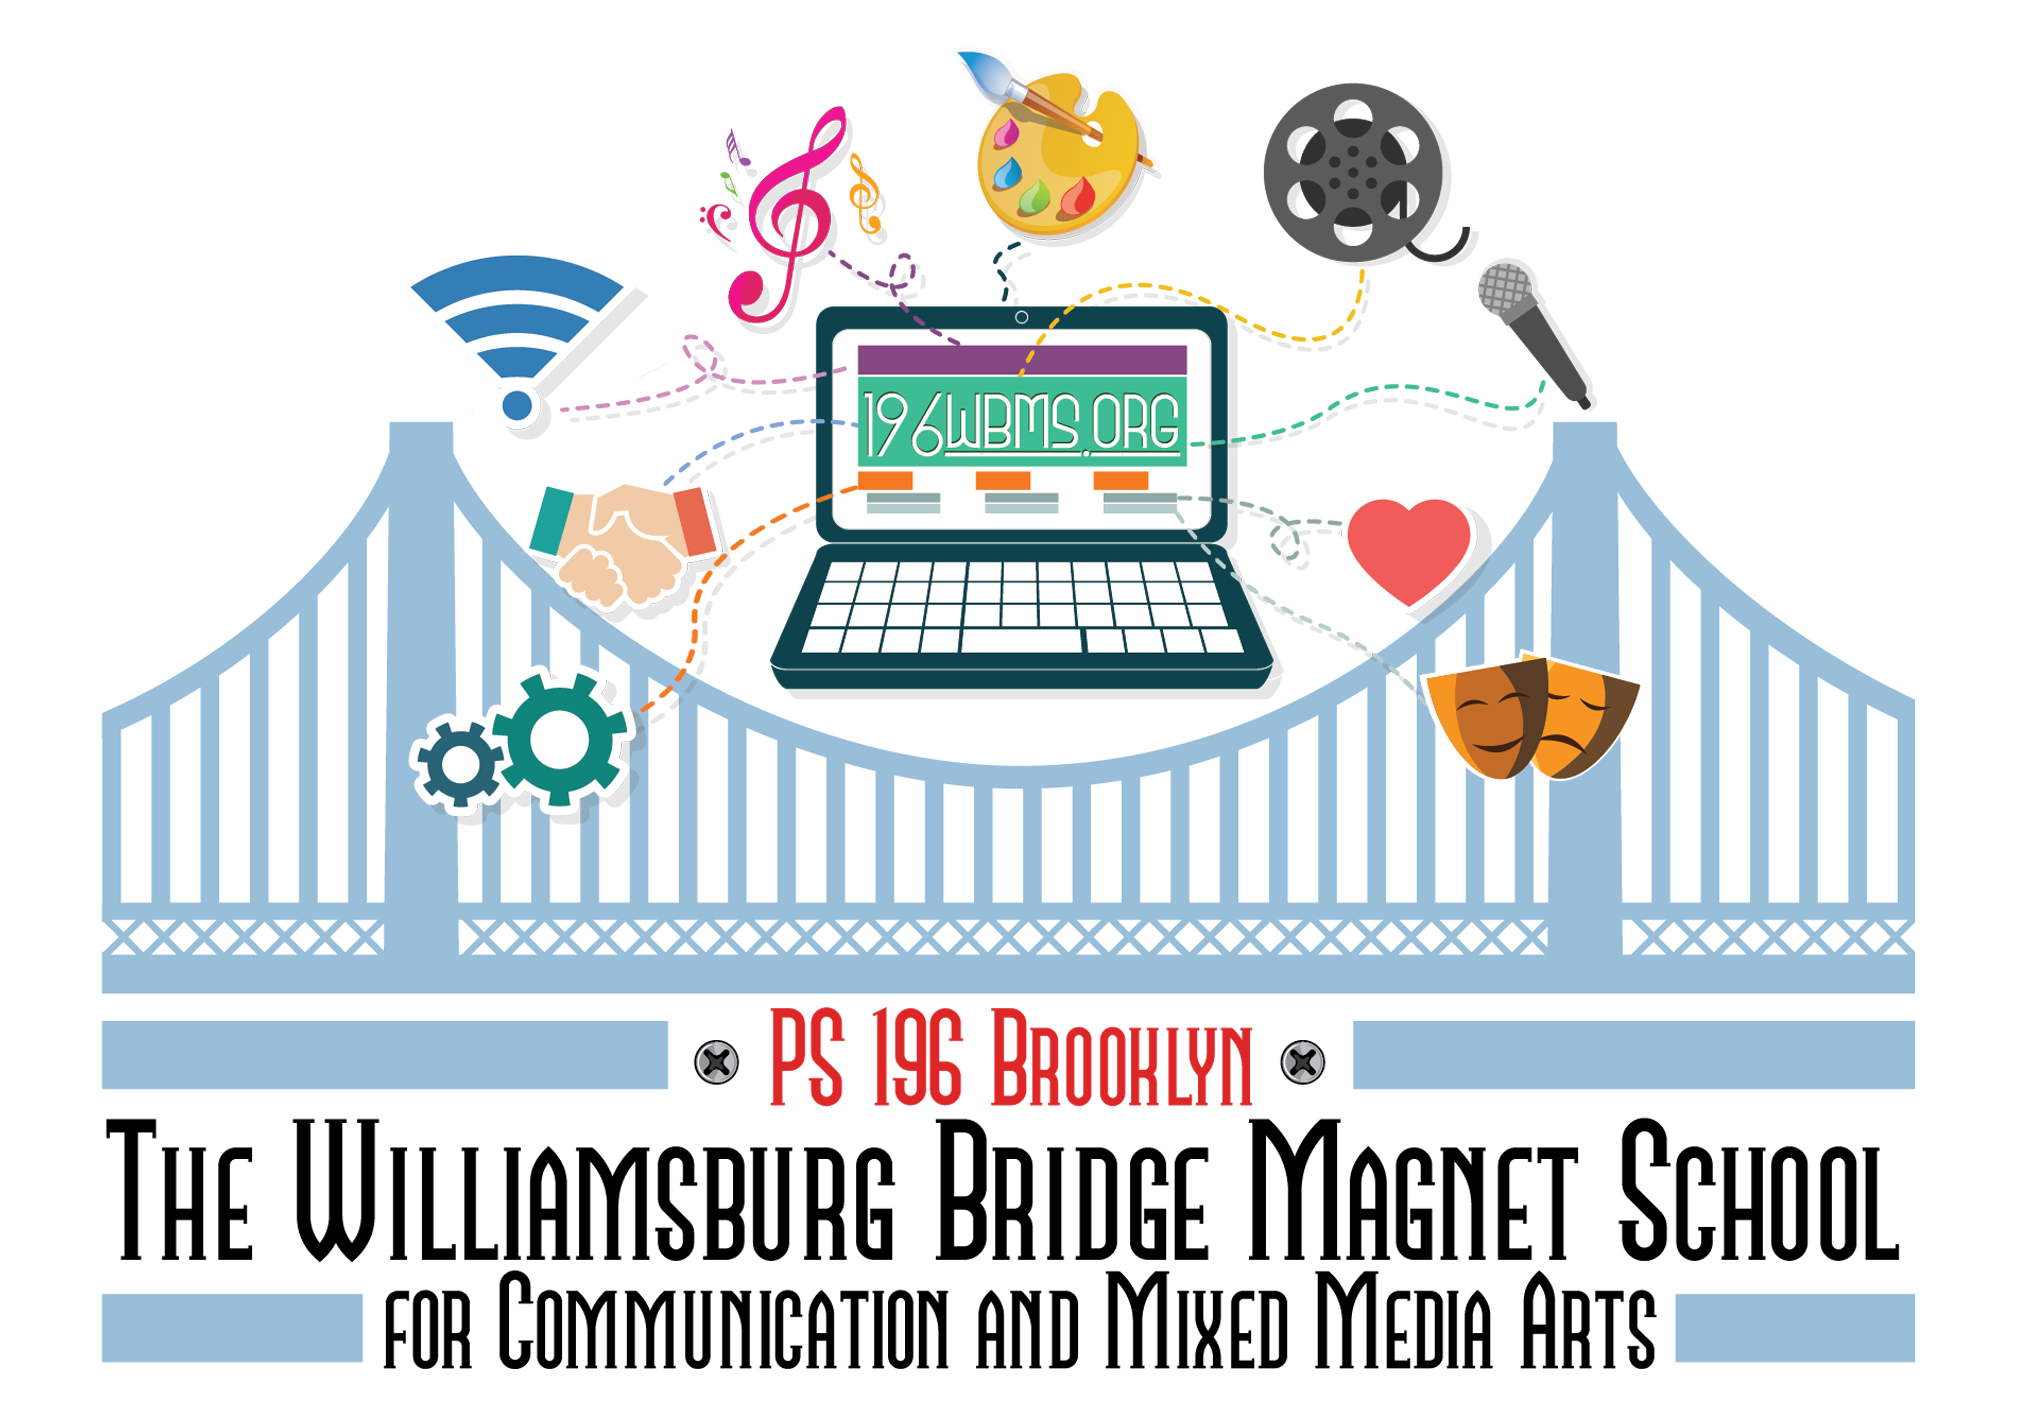 The Williamsburg Bridge Magnet School Home Page